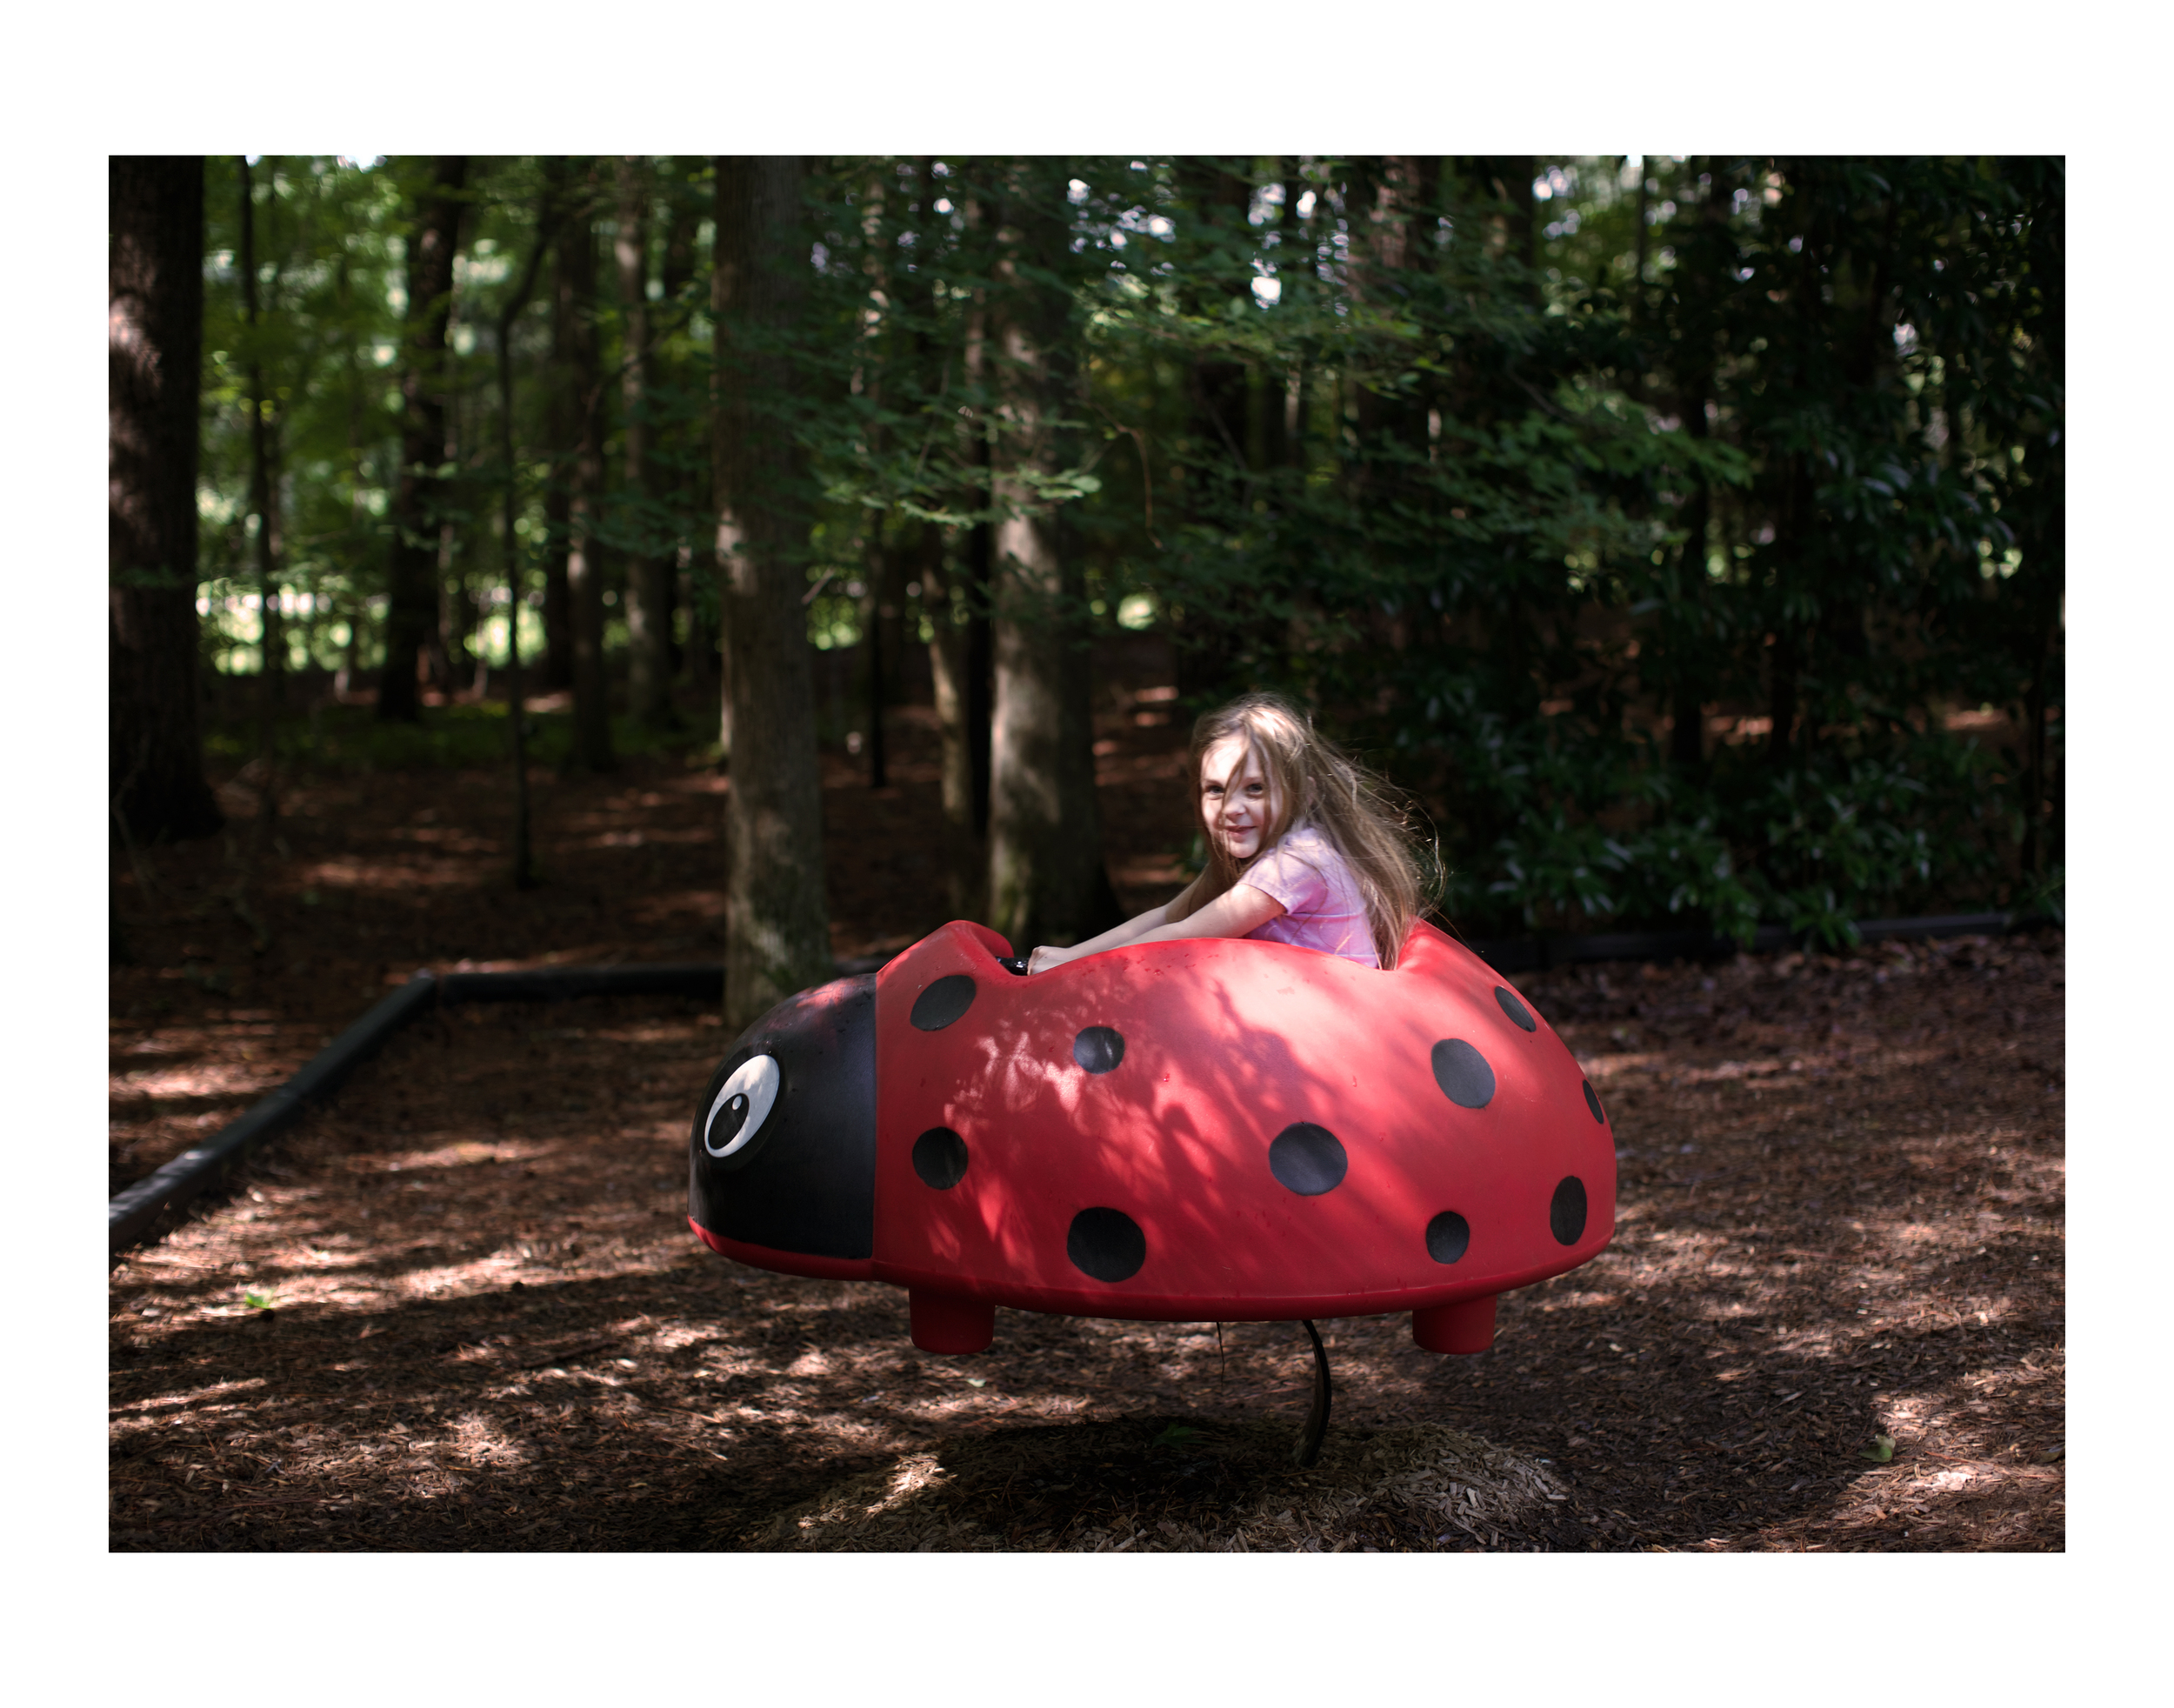 Karina riding the ladybug at Sandy Bottom Nature Park.